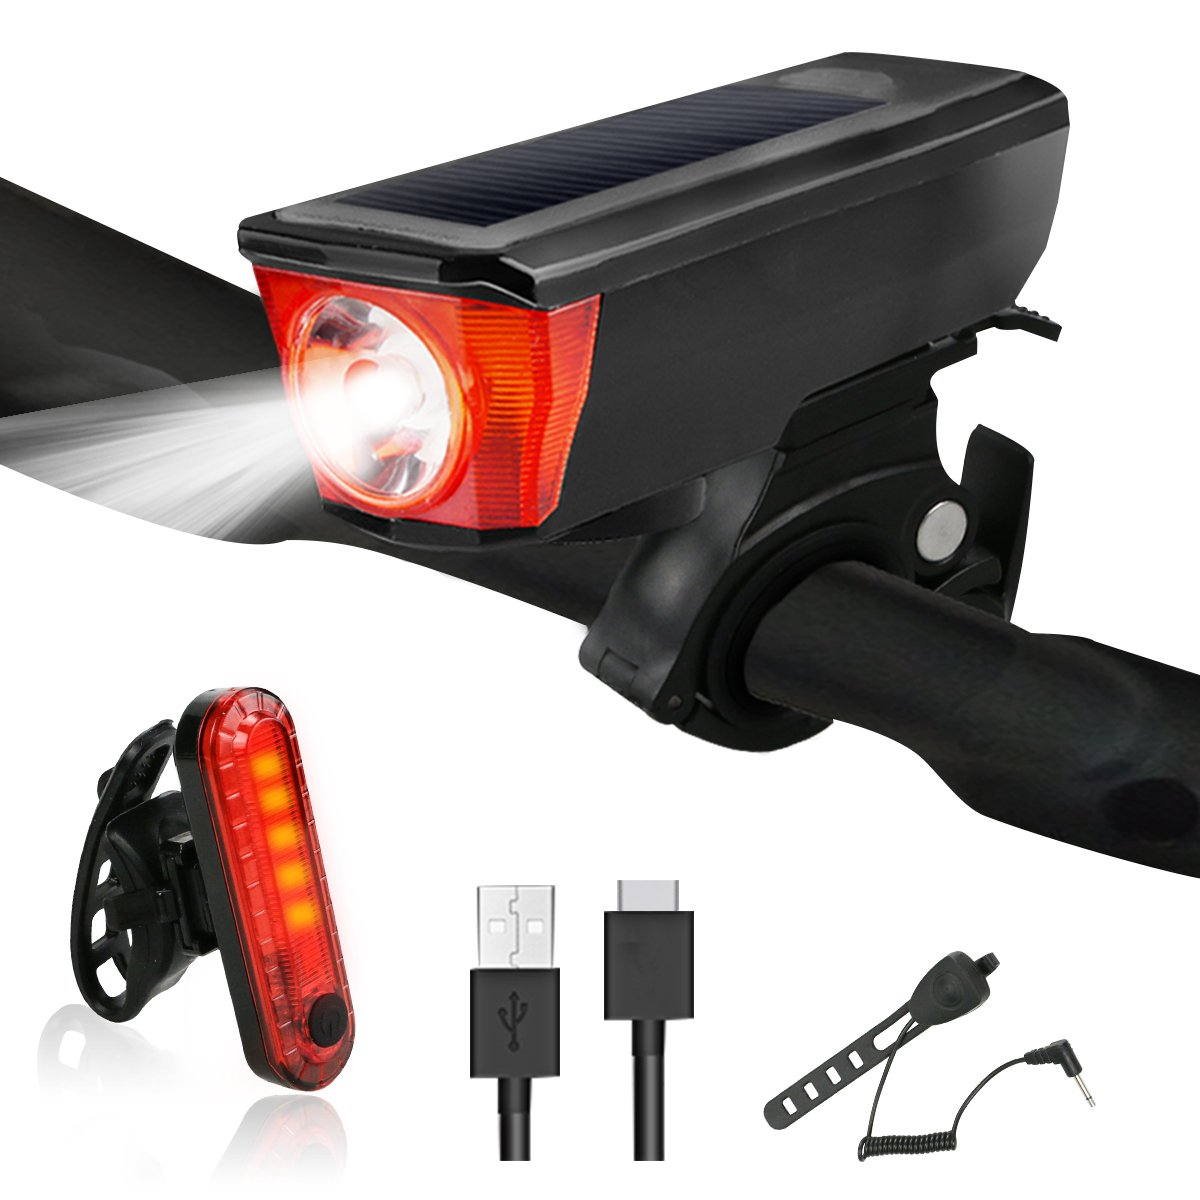 Yokunat Bike Lights, set di luci per bicicletta ricaricabile USB, montagna bicicletta luce LED con 4modalità luce impermeabile facile da installare Ultimate Lighting